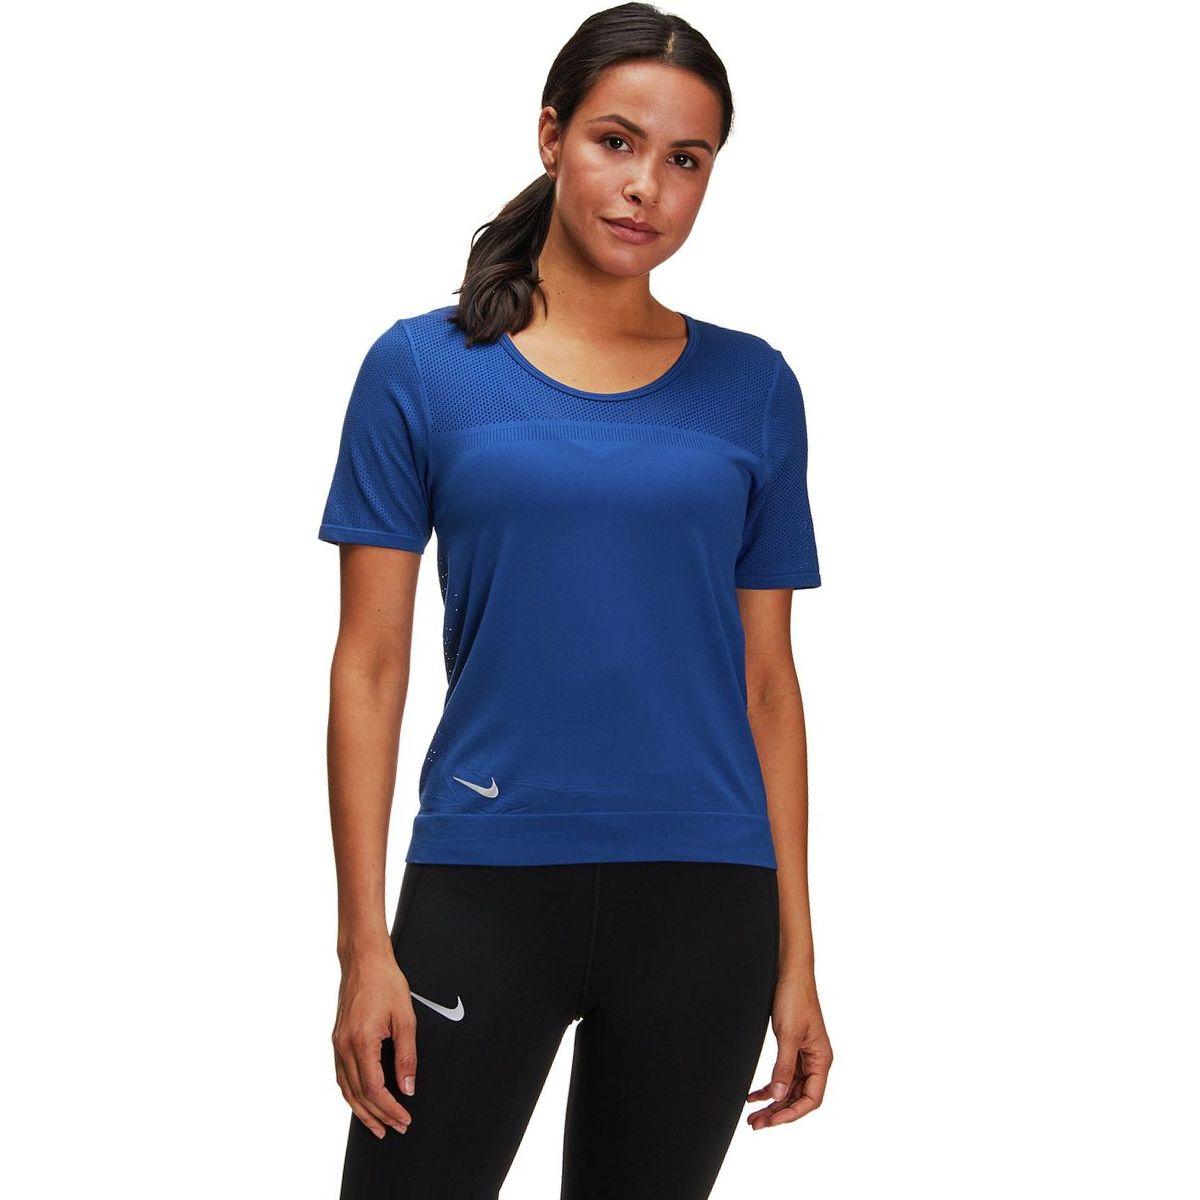 Nike Infinite Short-Sleeve Top - Women's